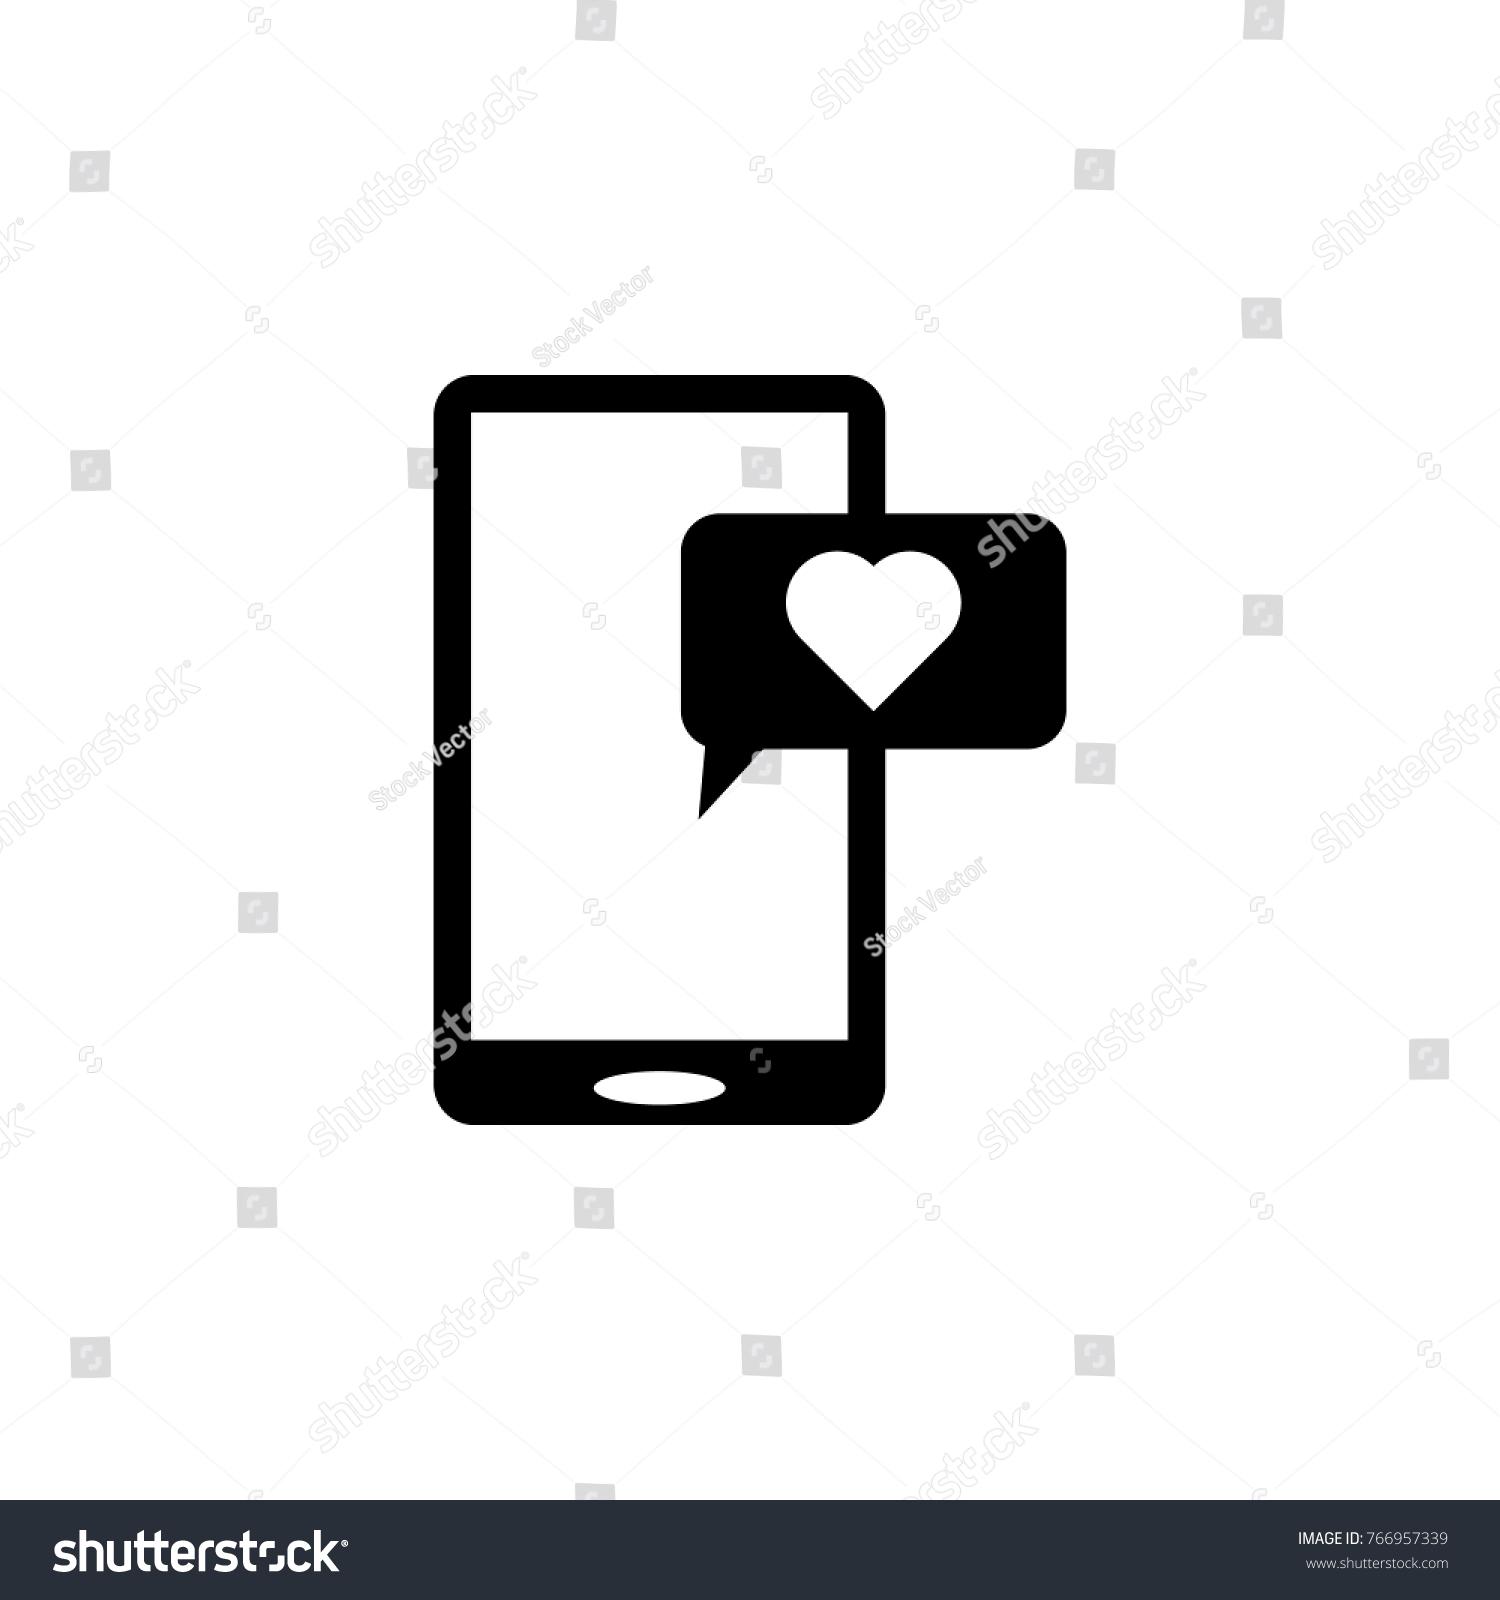 Smartphone heart message icon love couple stock illustration smartphone with heart message icon love or couple element icon premium quality graphic design biocorpaavc